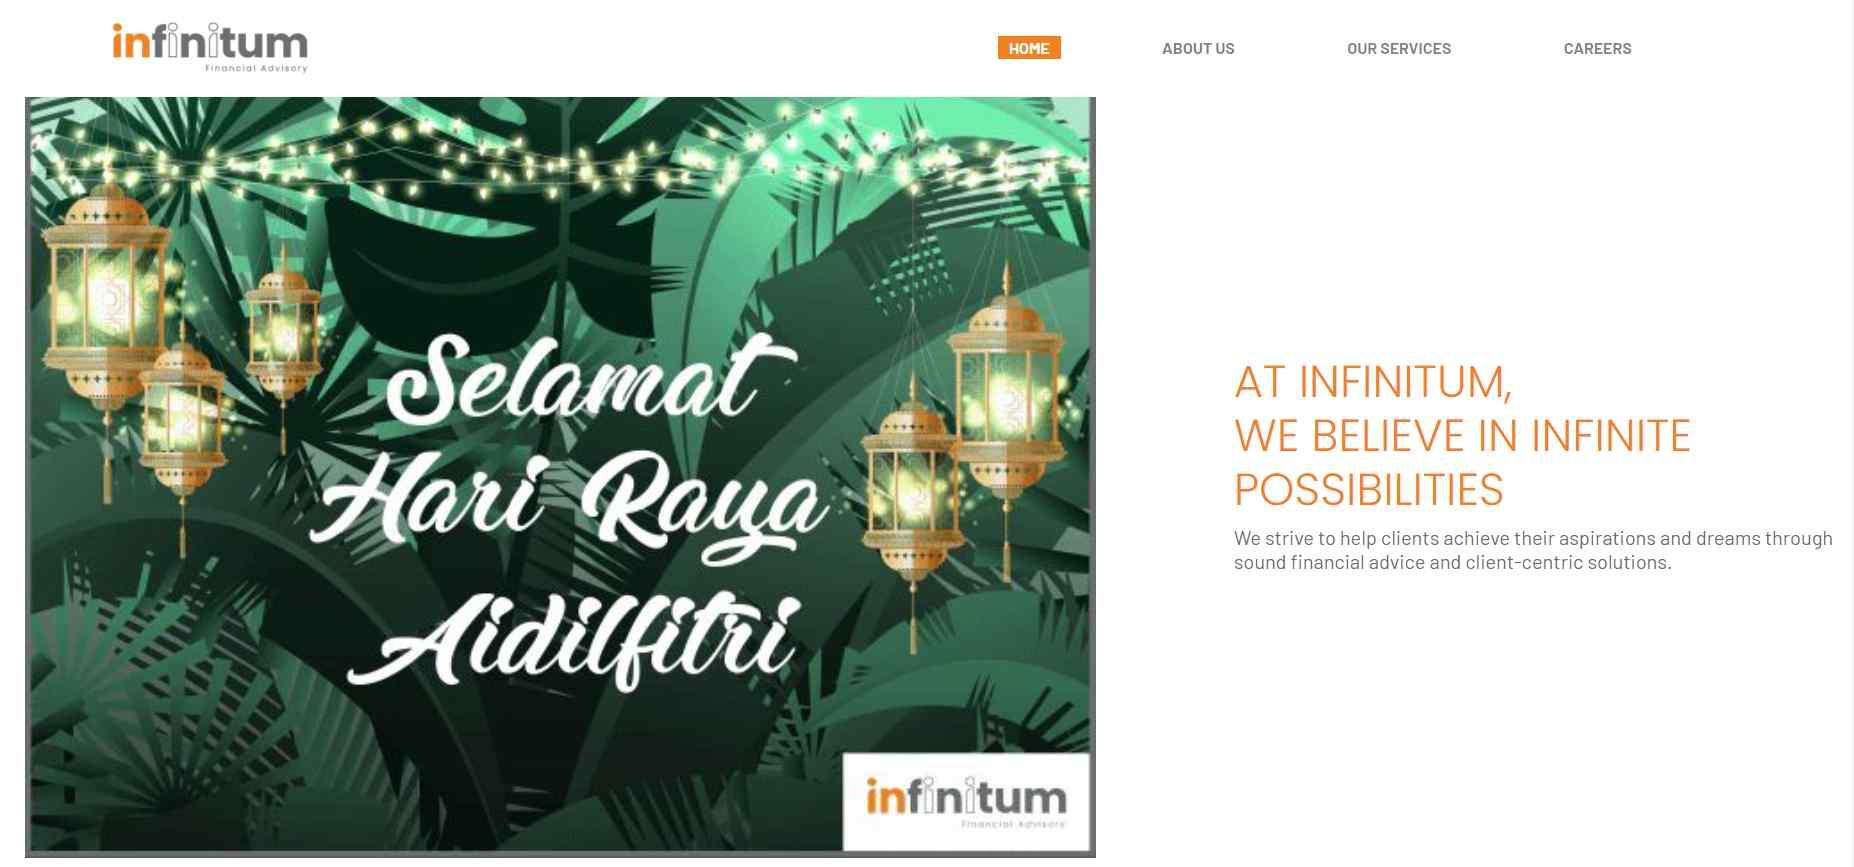 infinitum Top Financial Advisors in Singapore